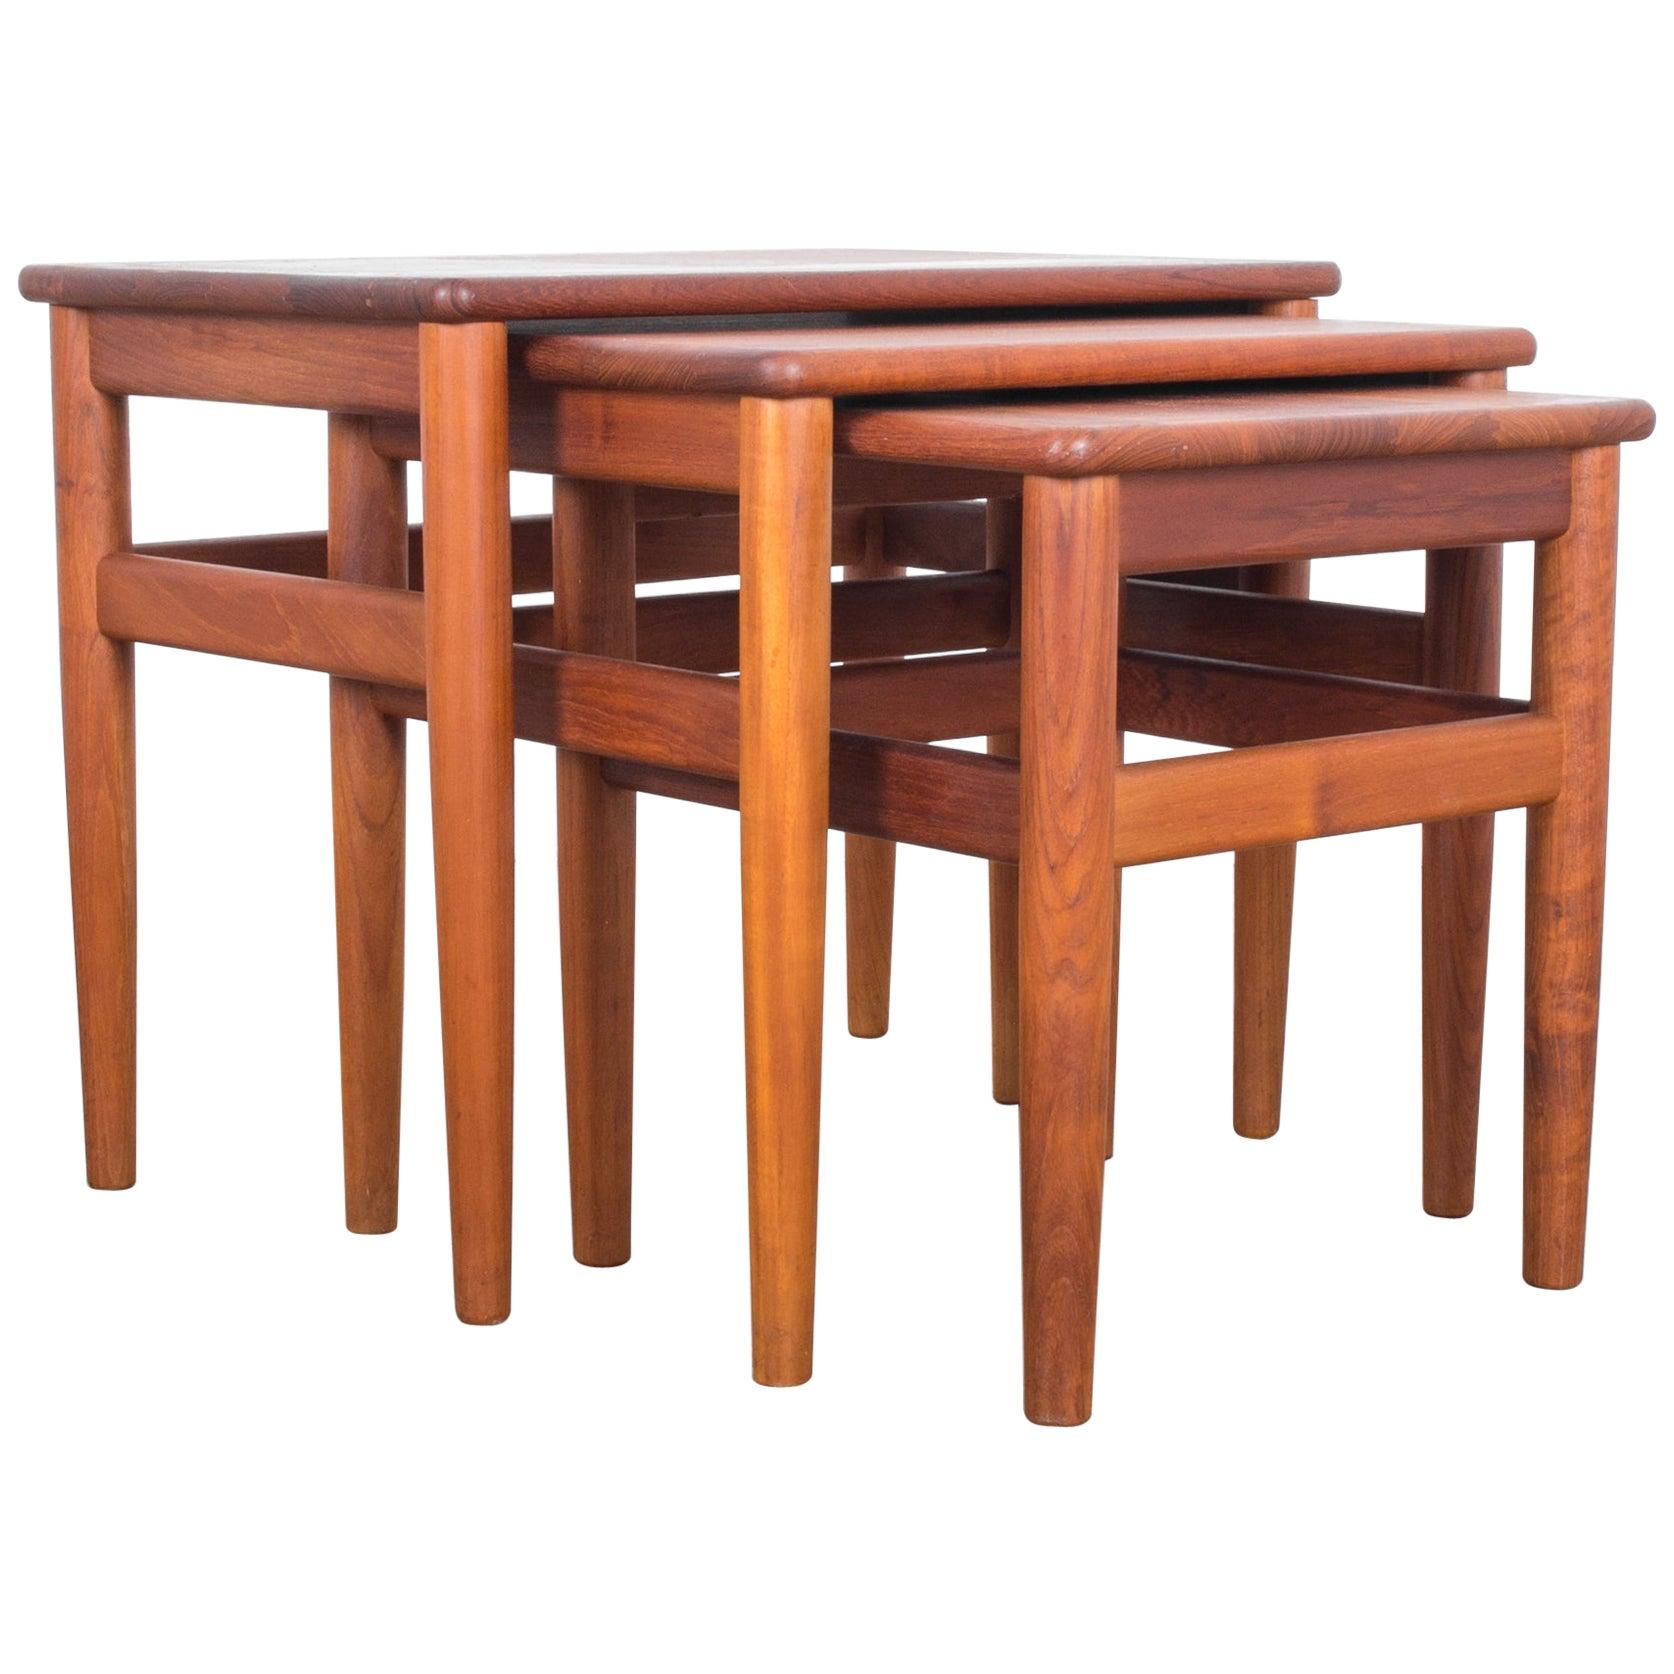 1960s Danish Teak Nesting Tables, Set of Three